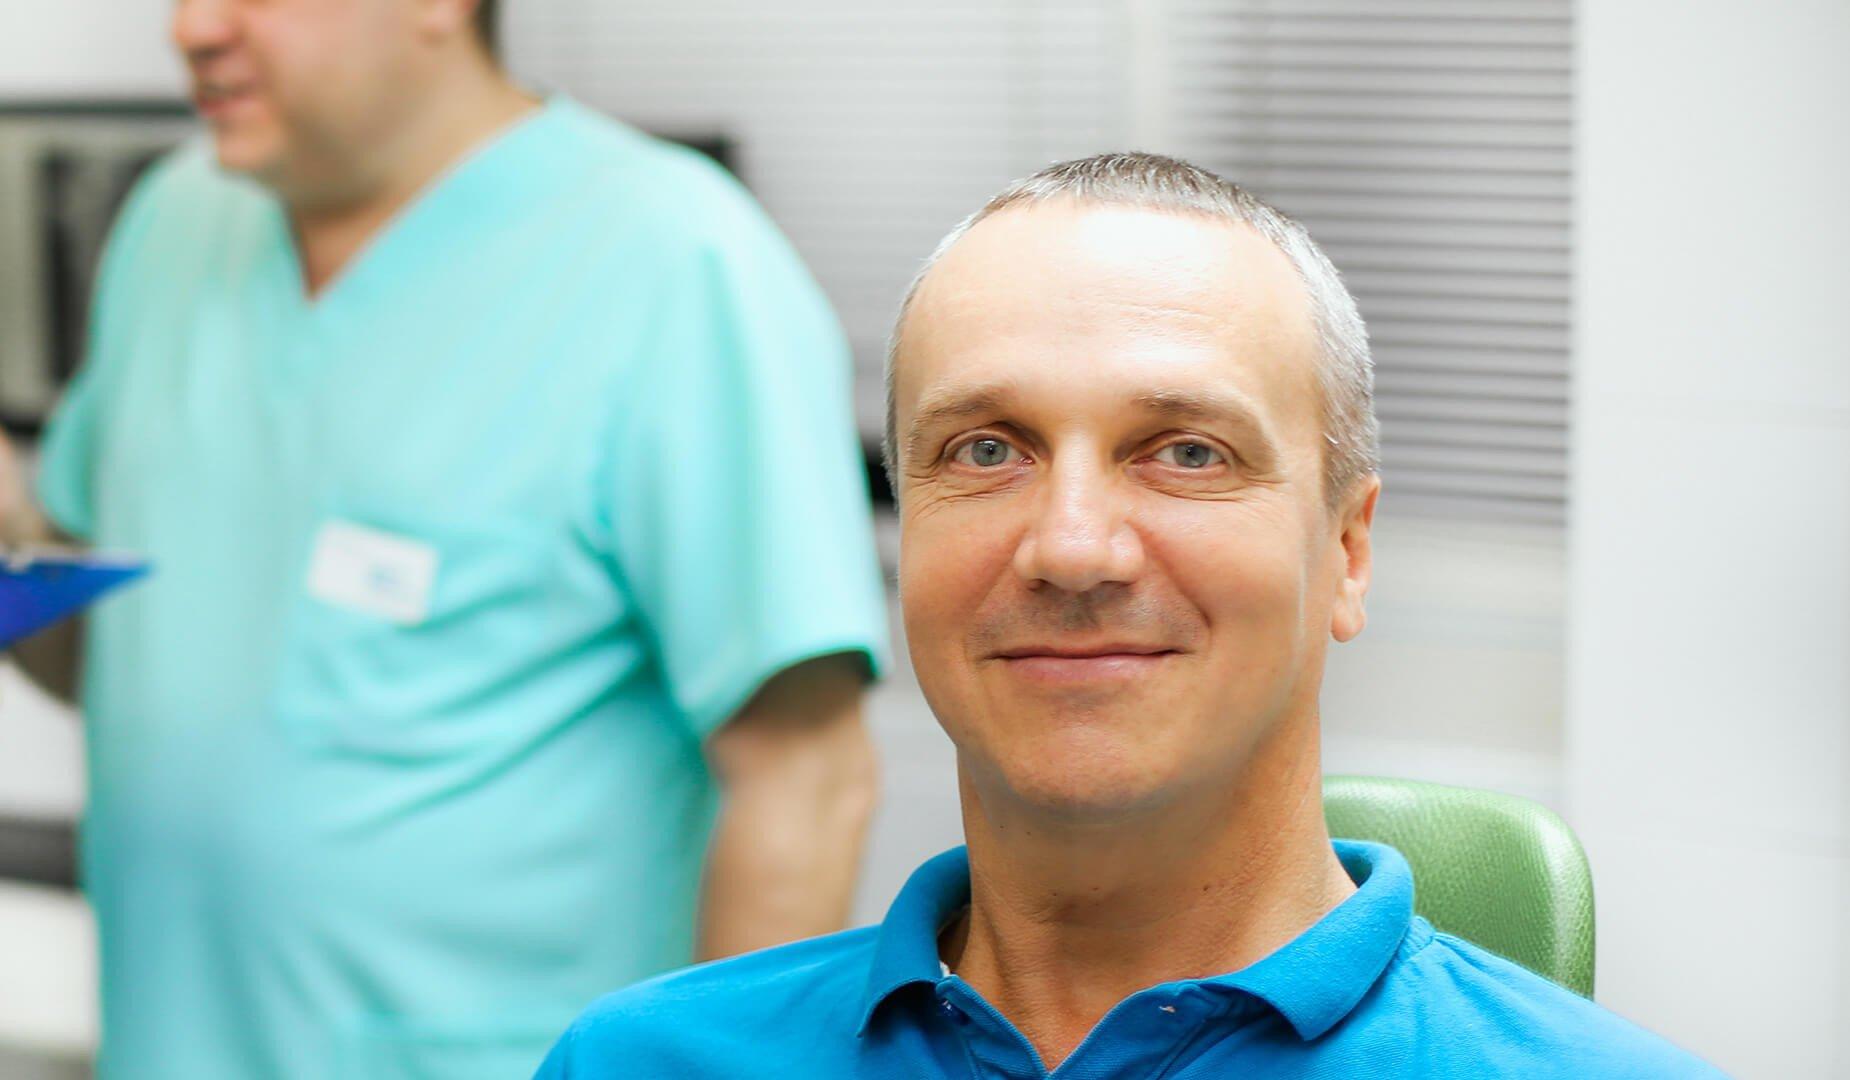 Пациент после имплантации